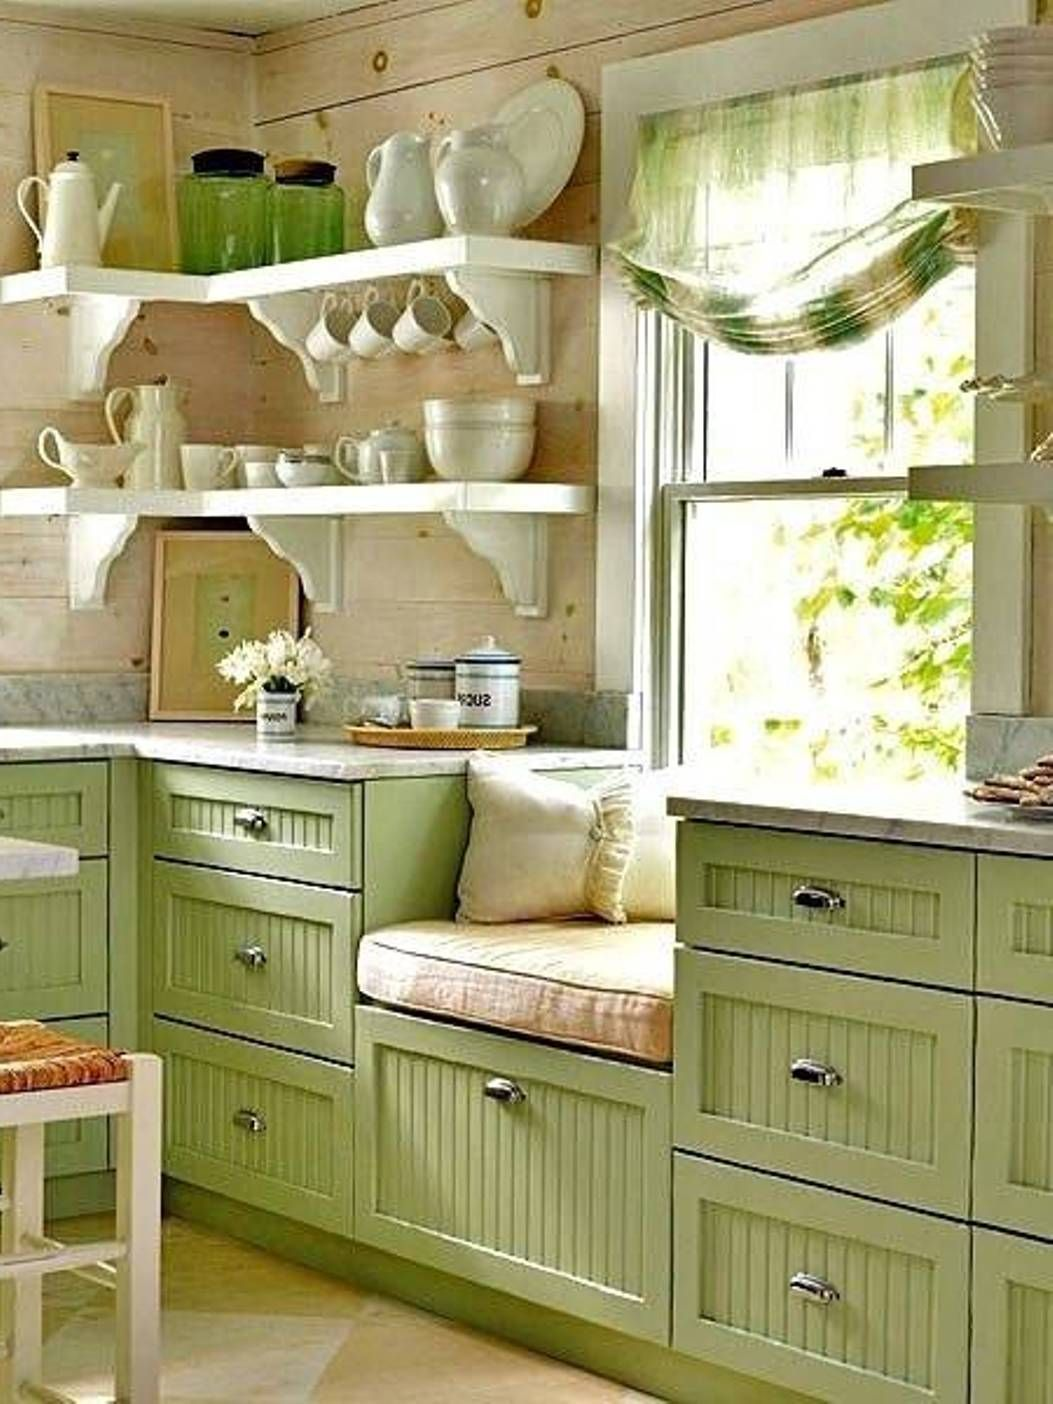 19 amazing kitchen decorating ideas com imagens decoração cozinha on farmhouse kitchen small id=97155